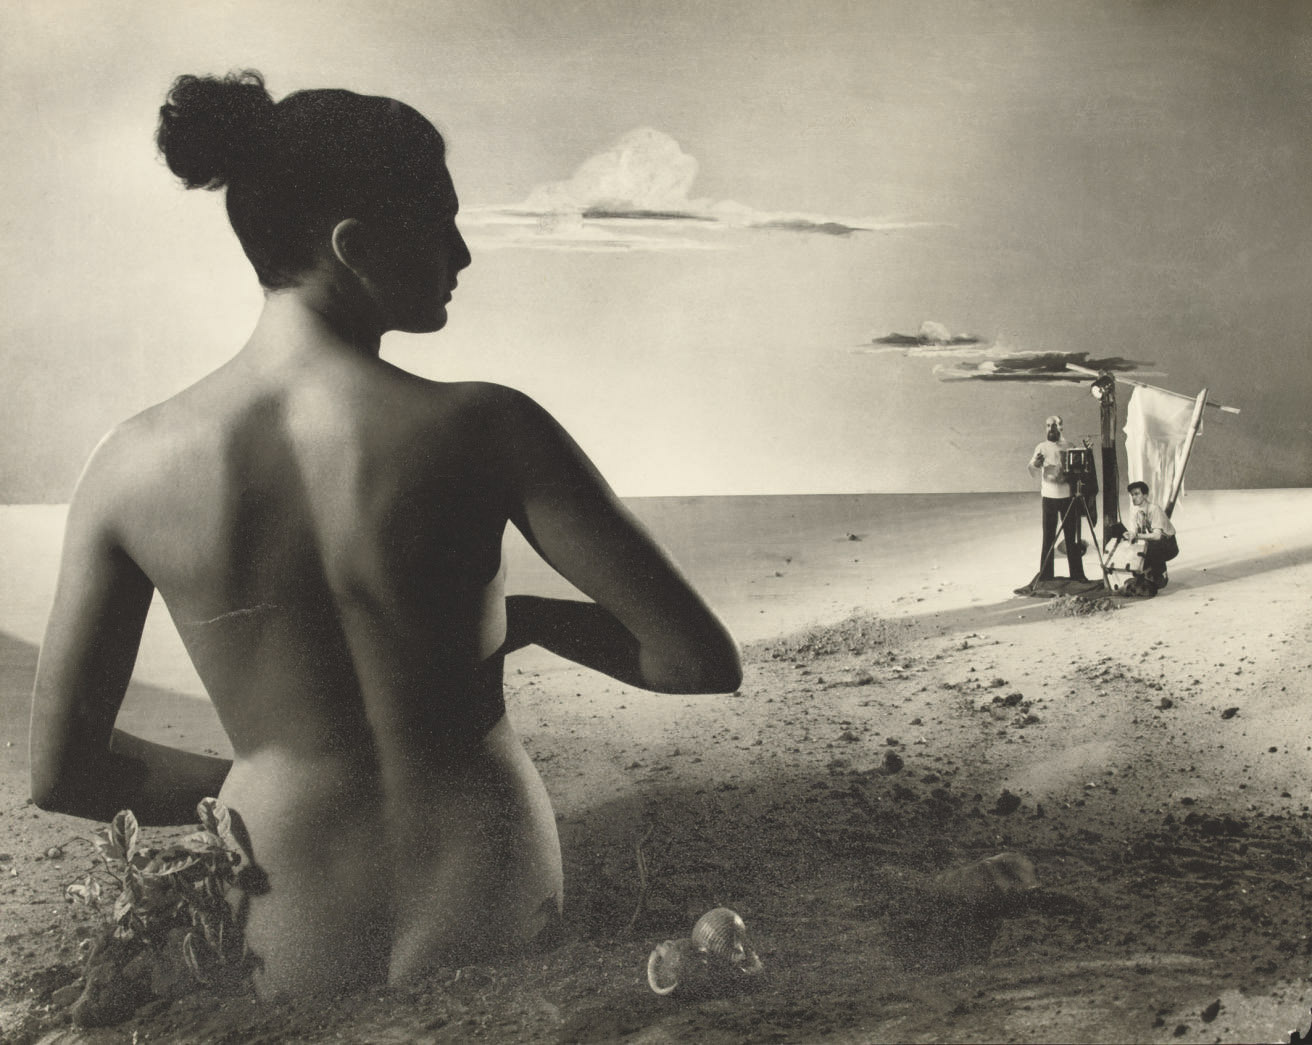 Surrealist Self-Portrait, 1949